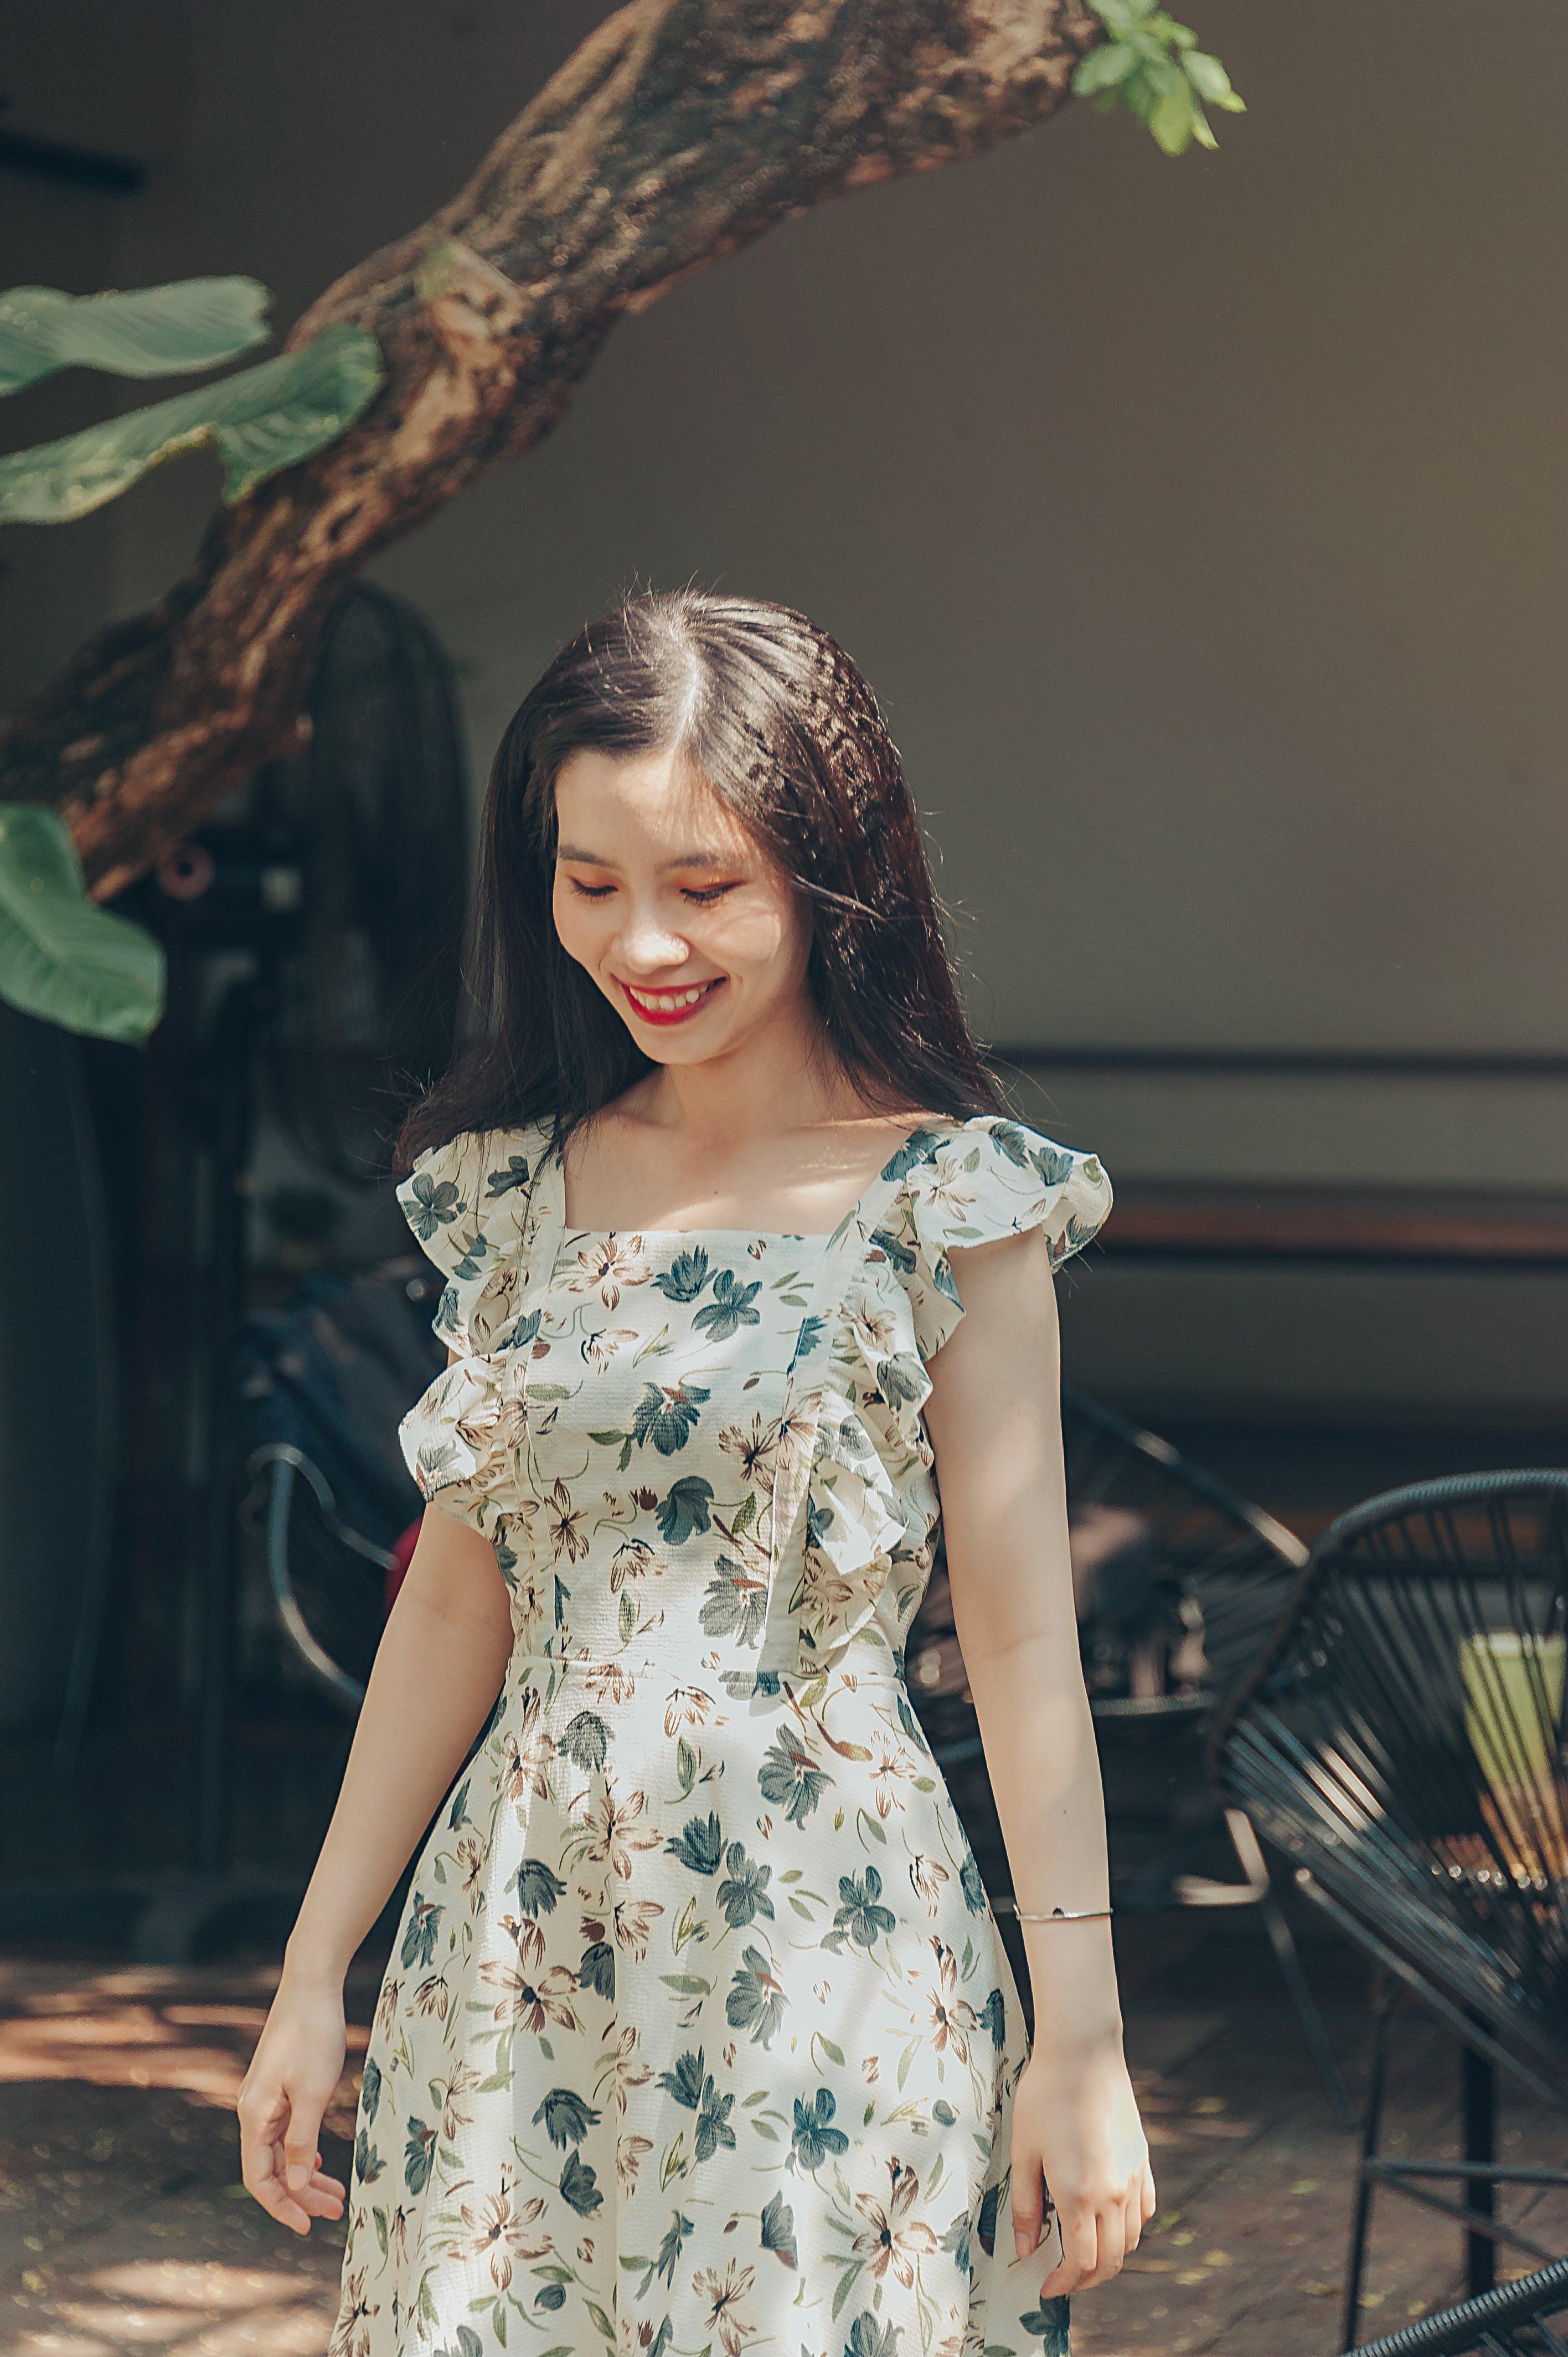 Woman Wearing Floral Dress Standing Near Tree